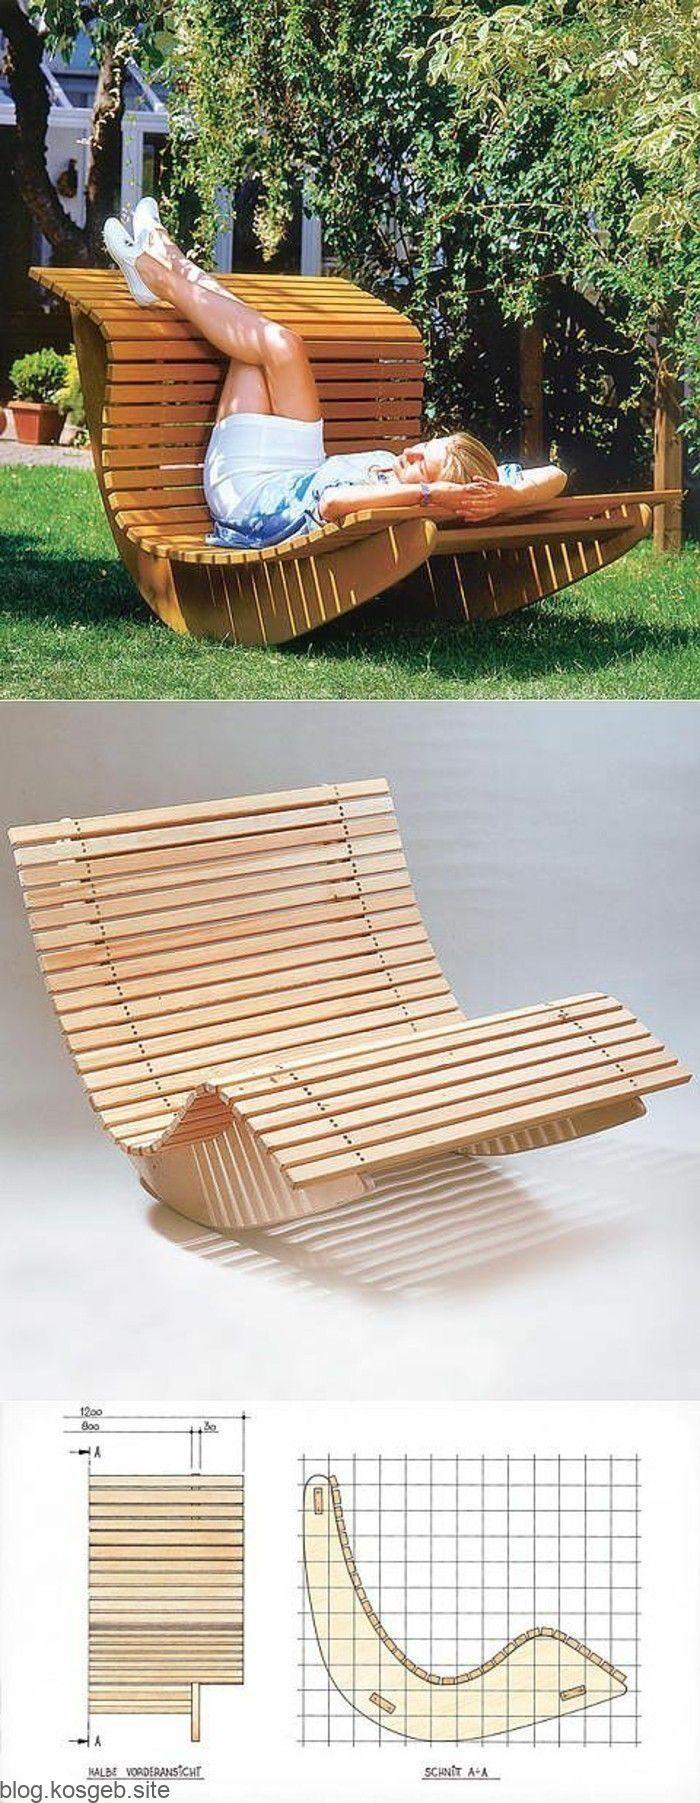 Bauen Sie Ihren Diy Sessel Selbst Aus Bauen Diysessel Holz Selber Anleitung Doityourself Europalette Eur Diy Tuinmeubilair Meubel Ideeën Hout Diy